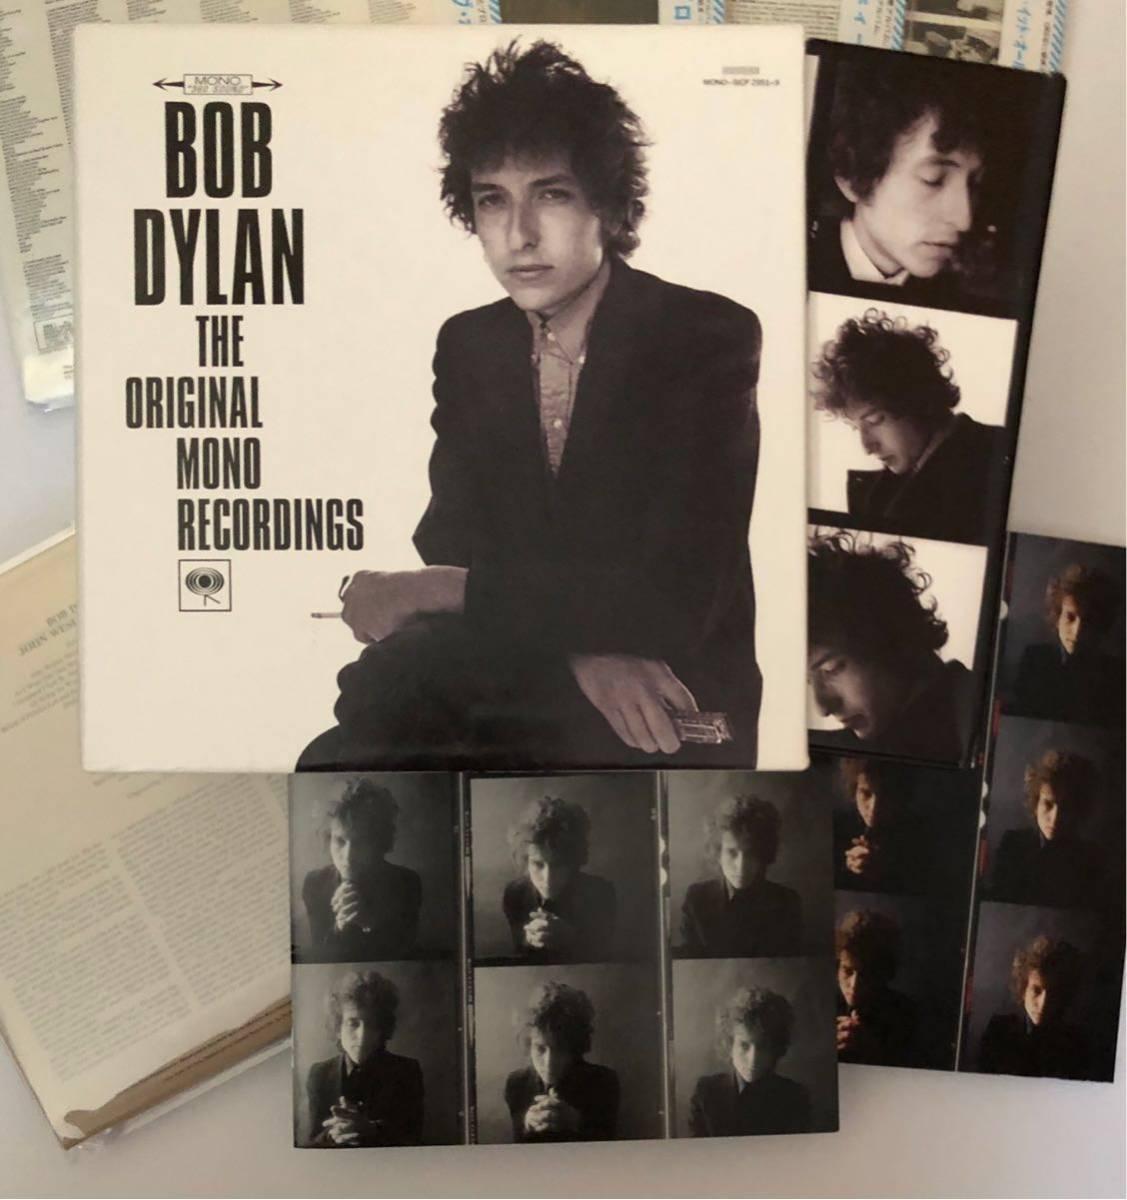 BOB DYLAN MONO BOX 9CD 国内 紙ジャケ キャップ帯付き 解説 日本語ブックレット_画像3